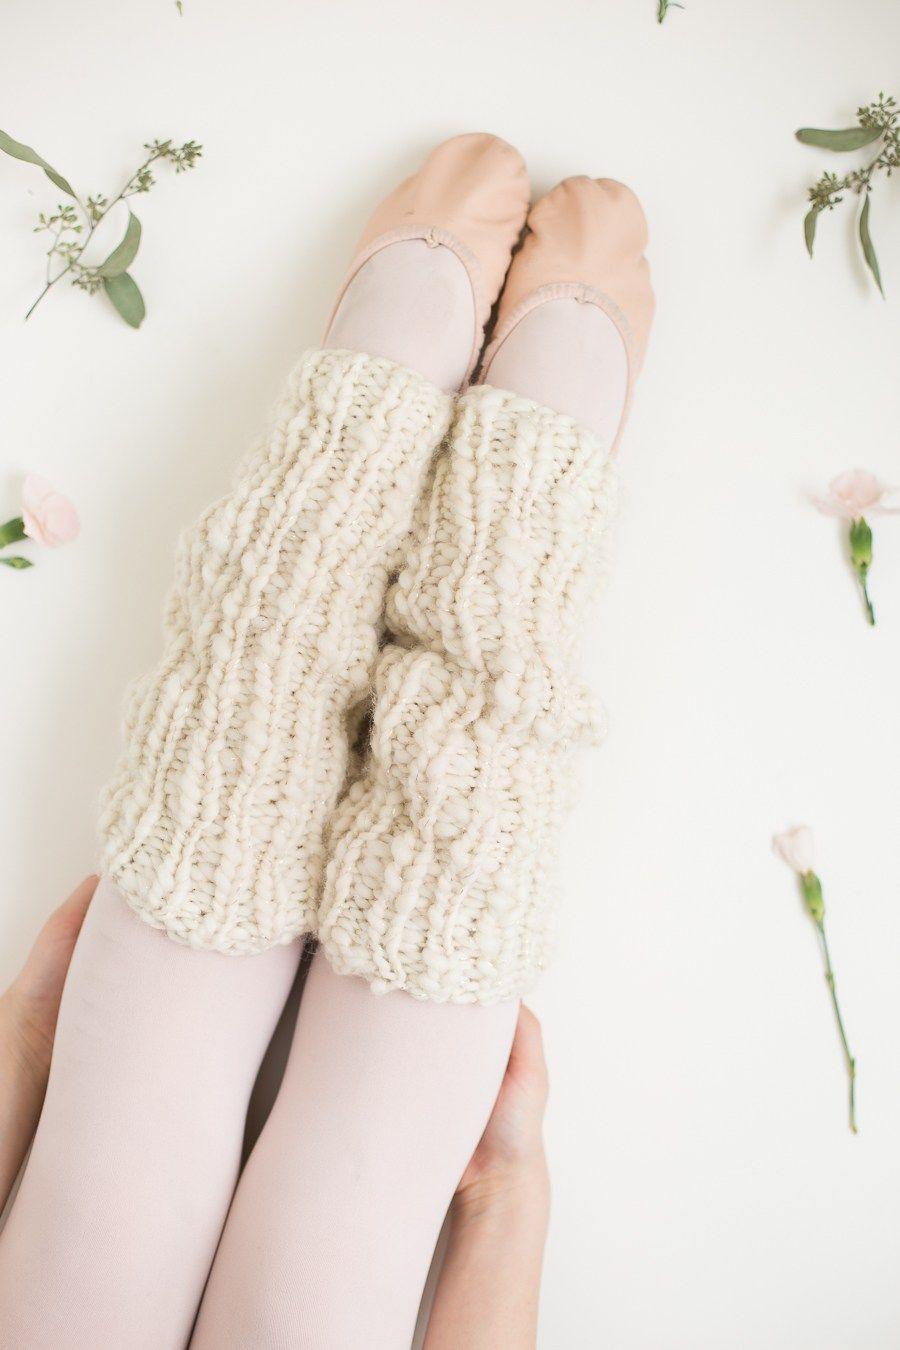 One Skein Knit Leg Warmers Pattern for Beginners